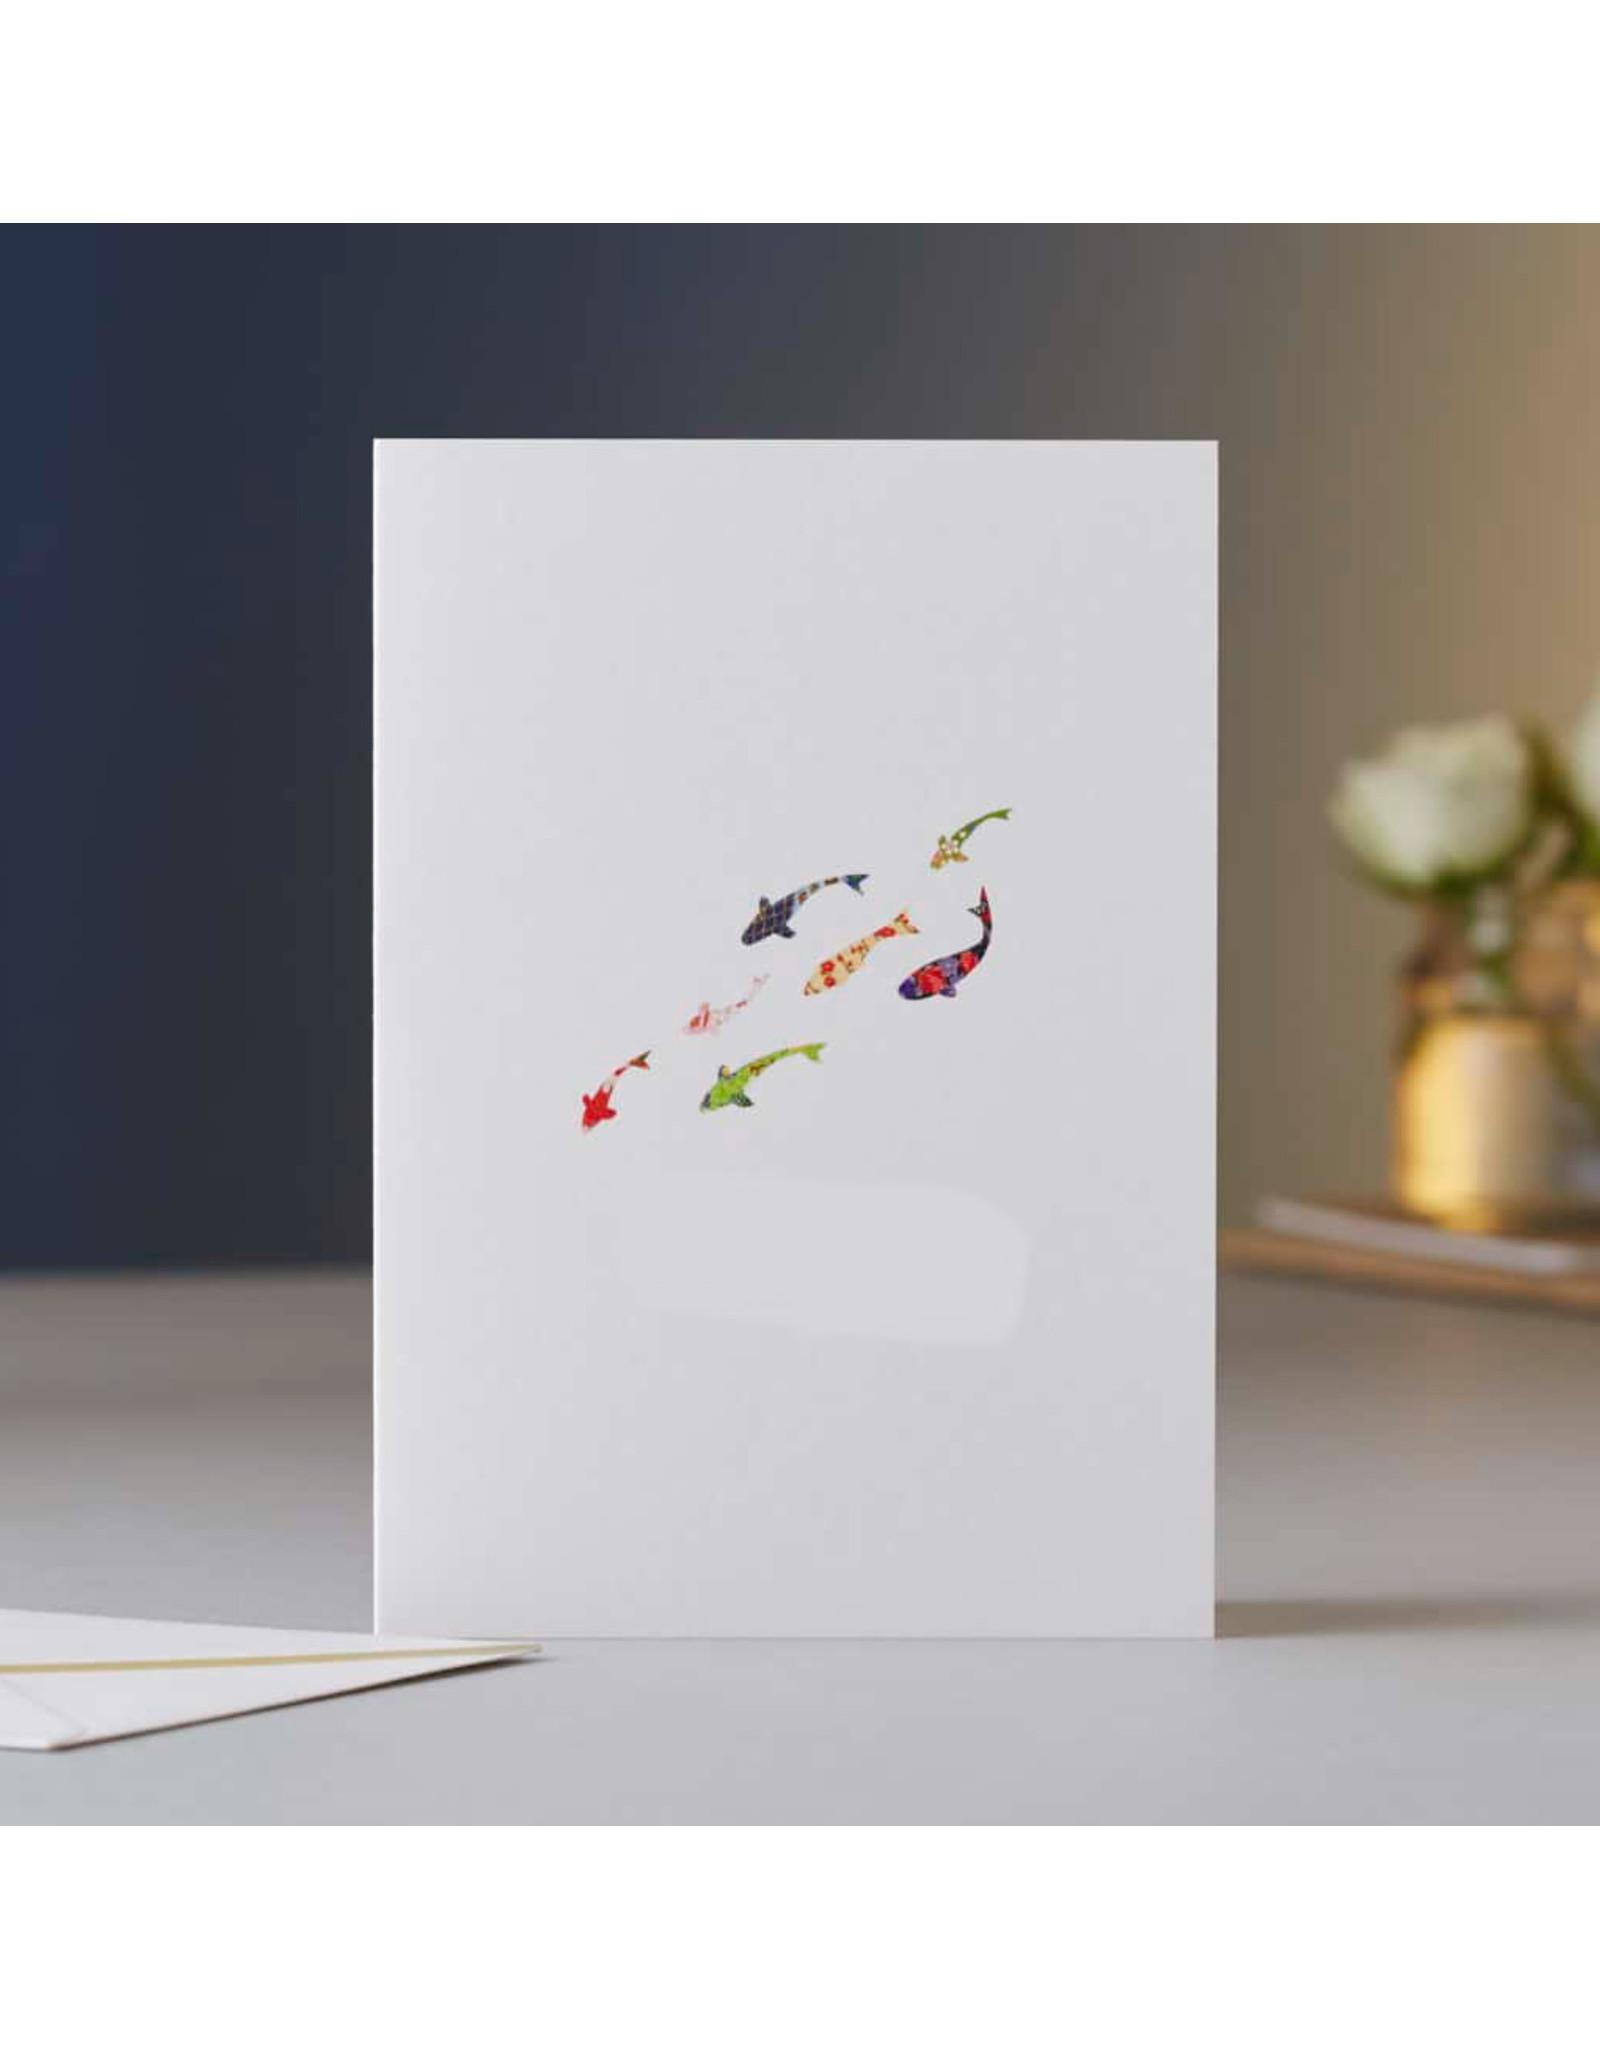 Eloise Halle Wenskaart - Koi carp drift - Dubbele Kaart + Envelop - 11,5 x 16,5 - Blanco